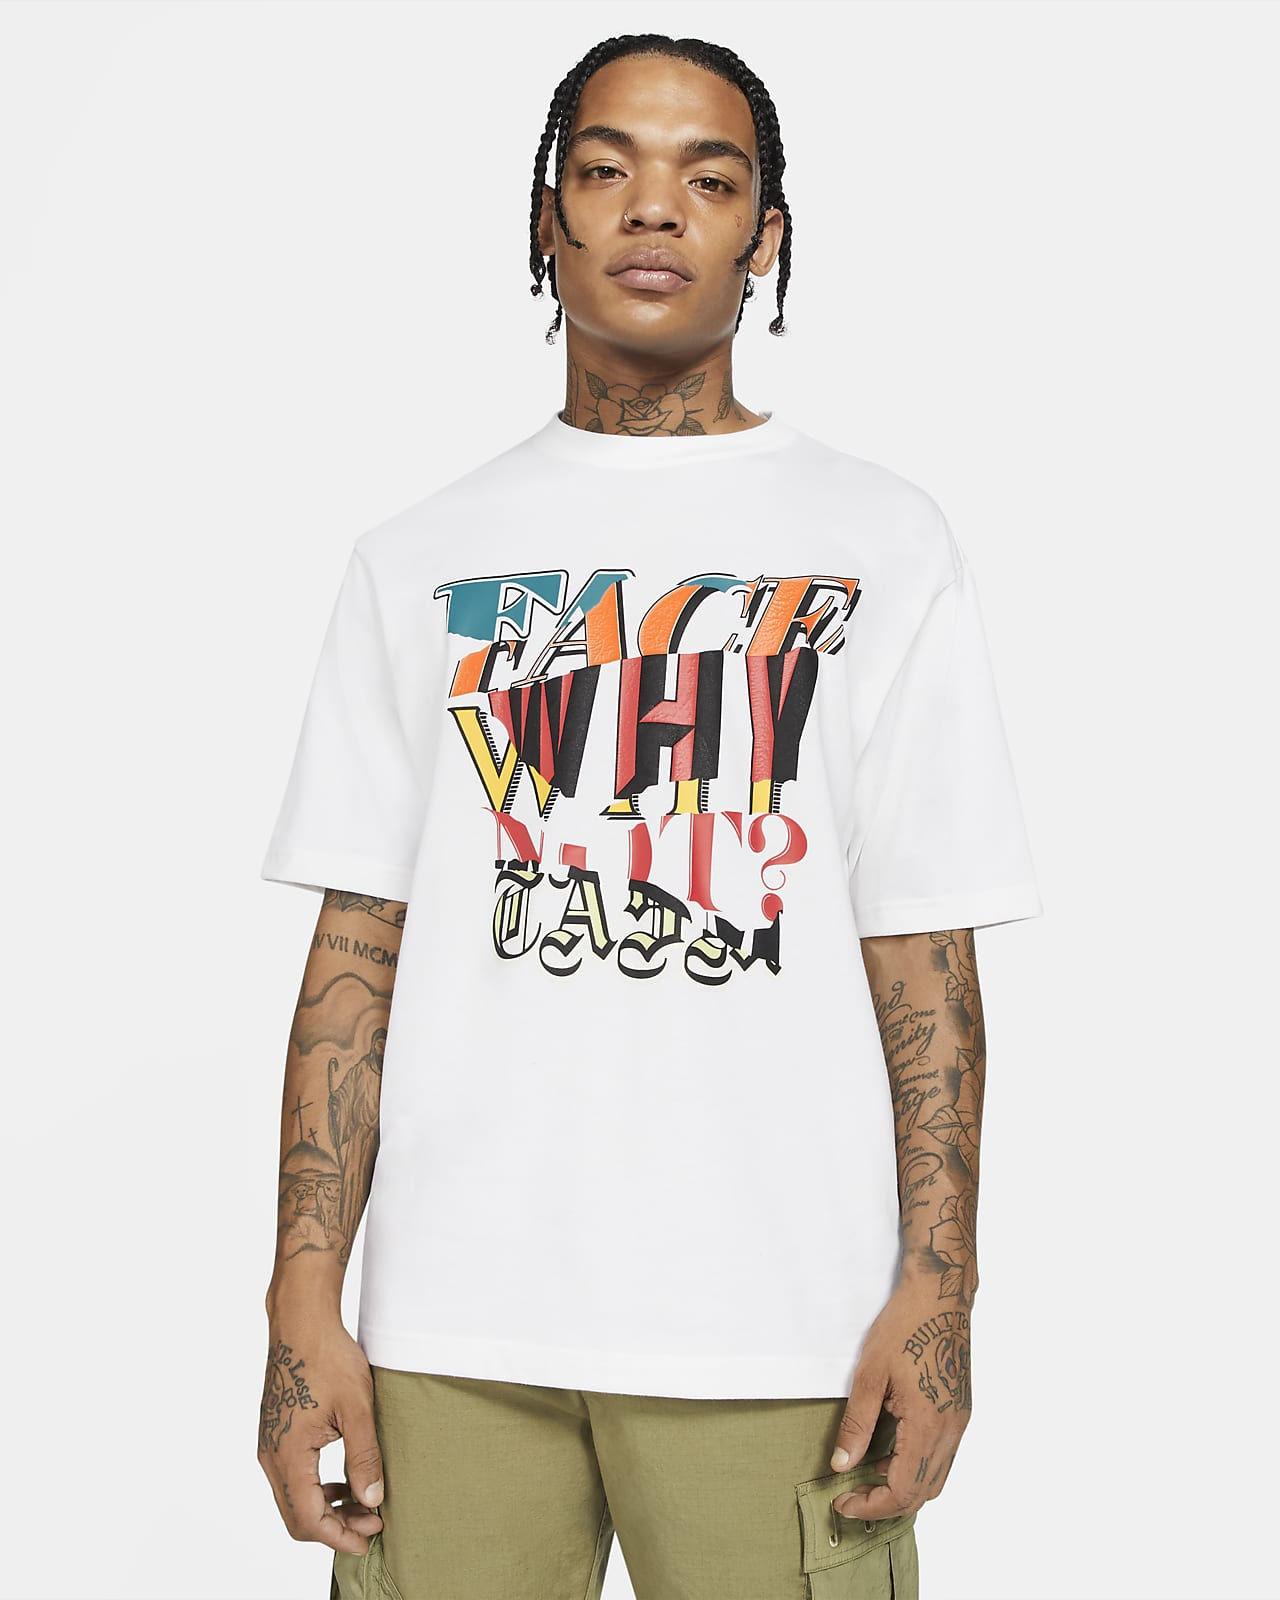 Jordan 'Why Not?' x Facetasm Men's Short-Sleeve T-Shirt